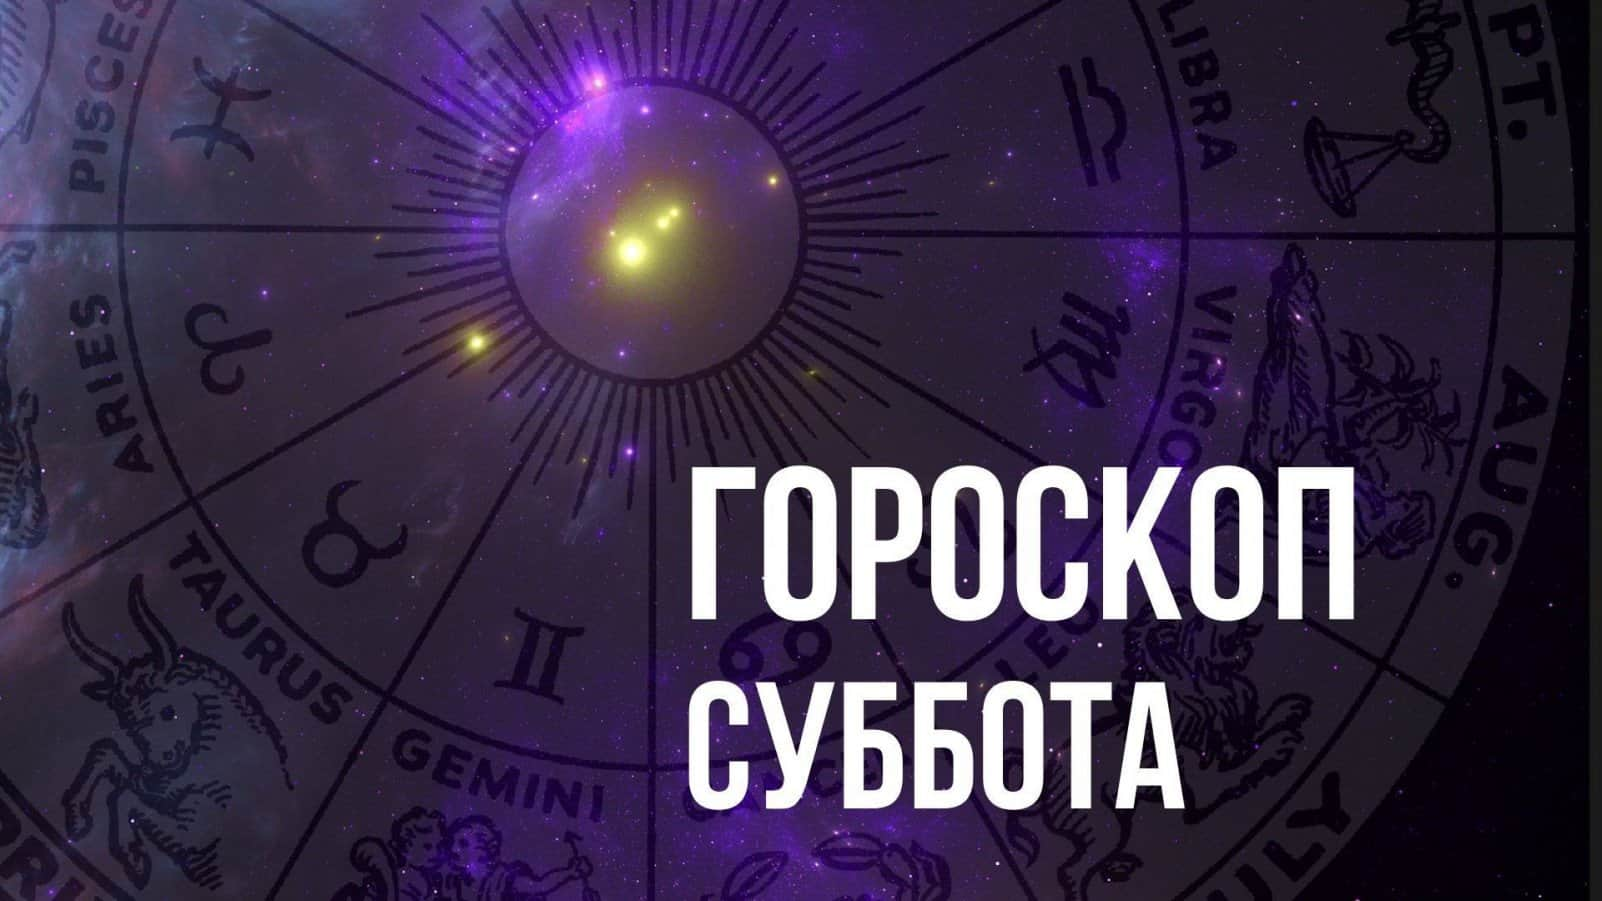 Гороскоп на субботу 5 июня для каждого знака Зодиака